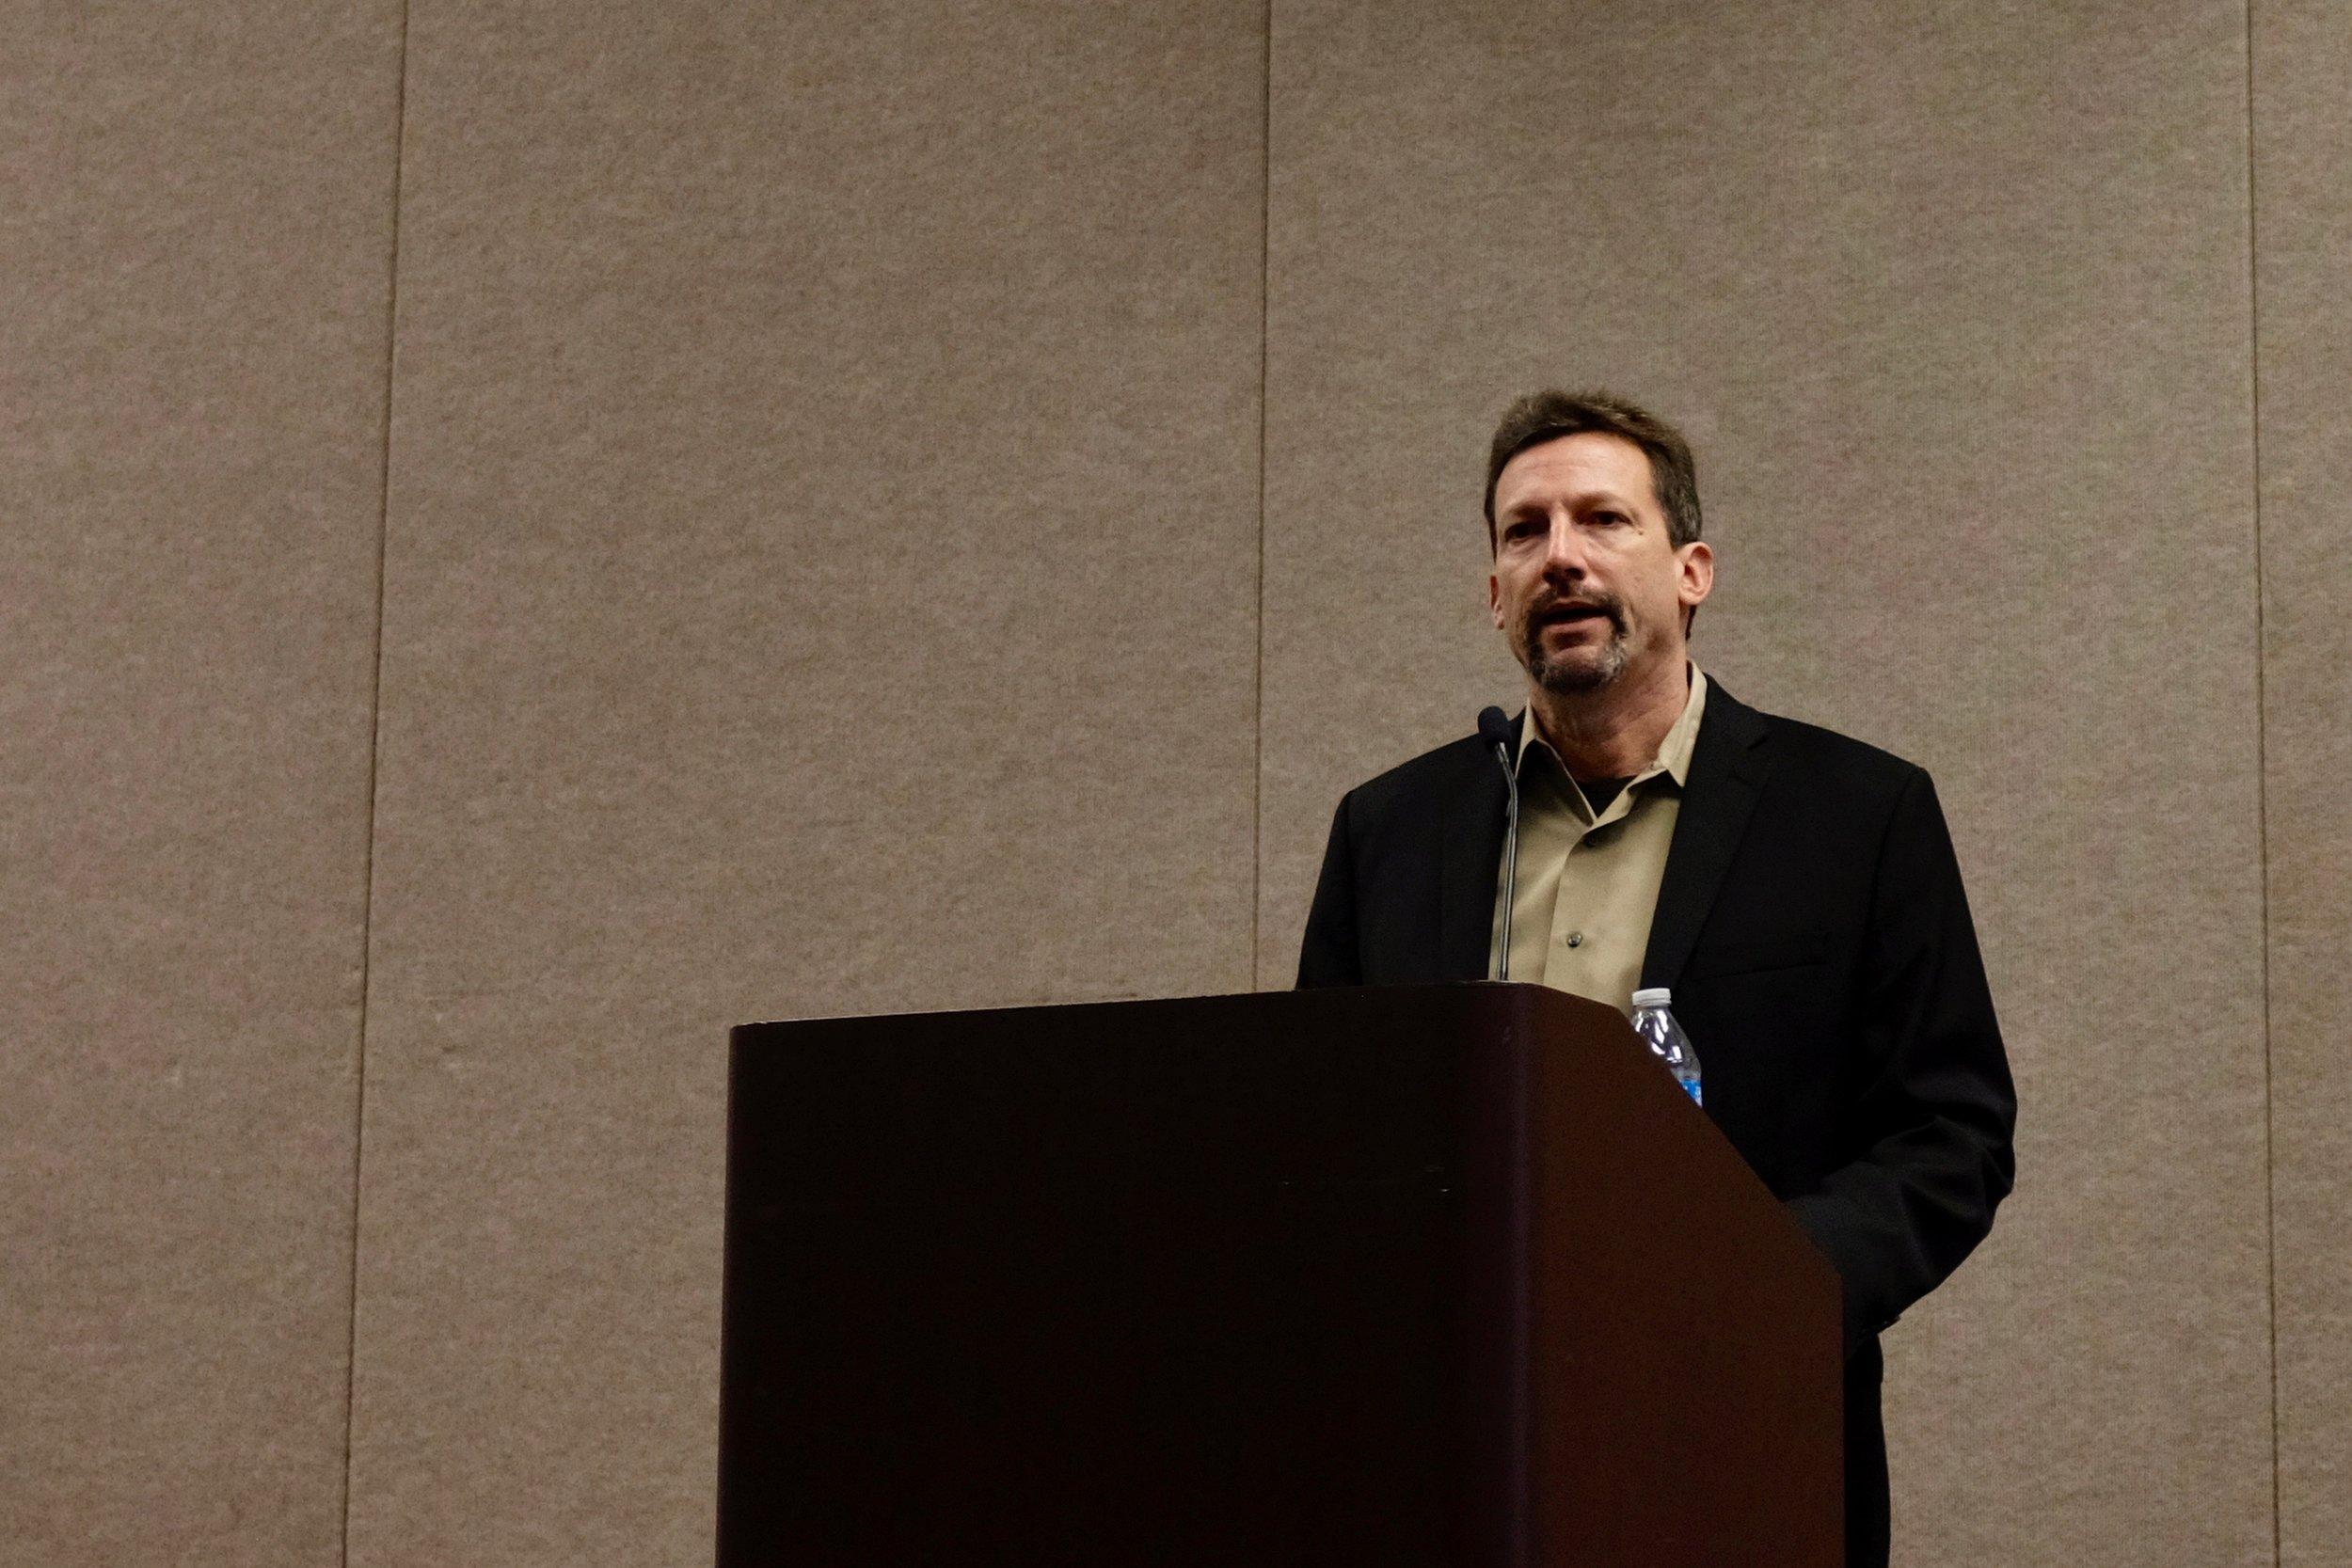 Jason Hartlove, CEO, Nanosys, presenting at the 2018 DSCC Future Display conference in Santa Clara